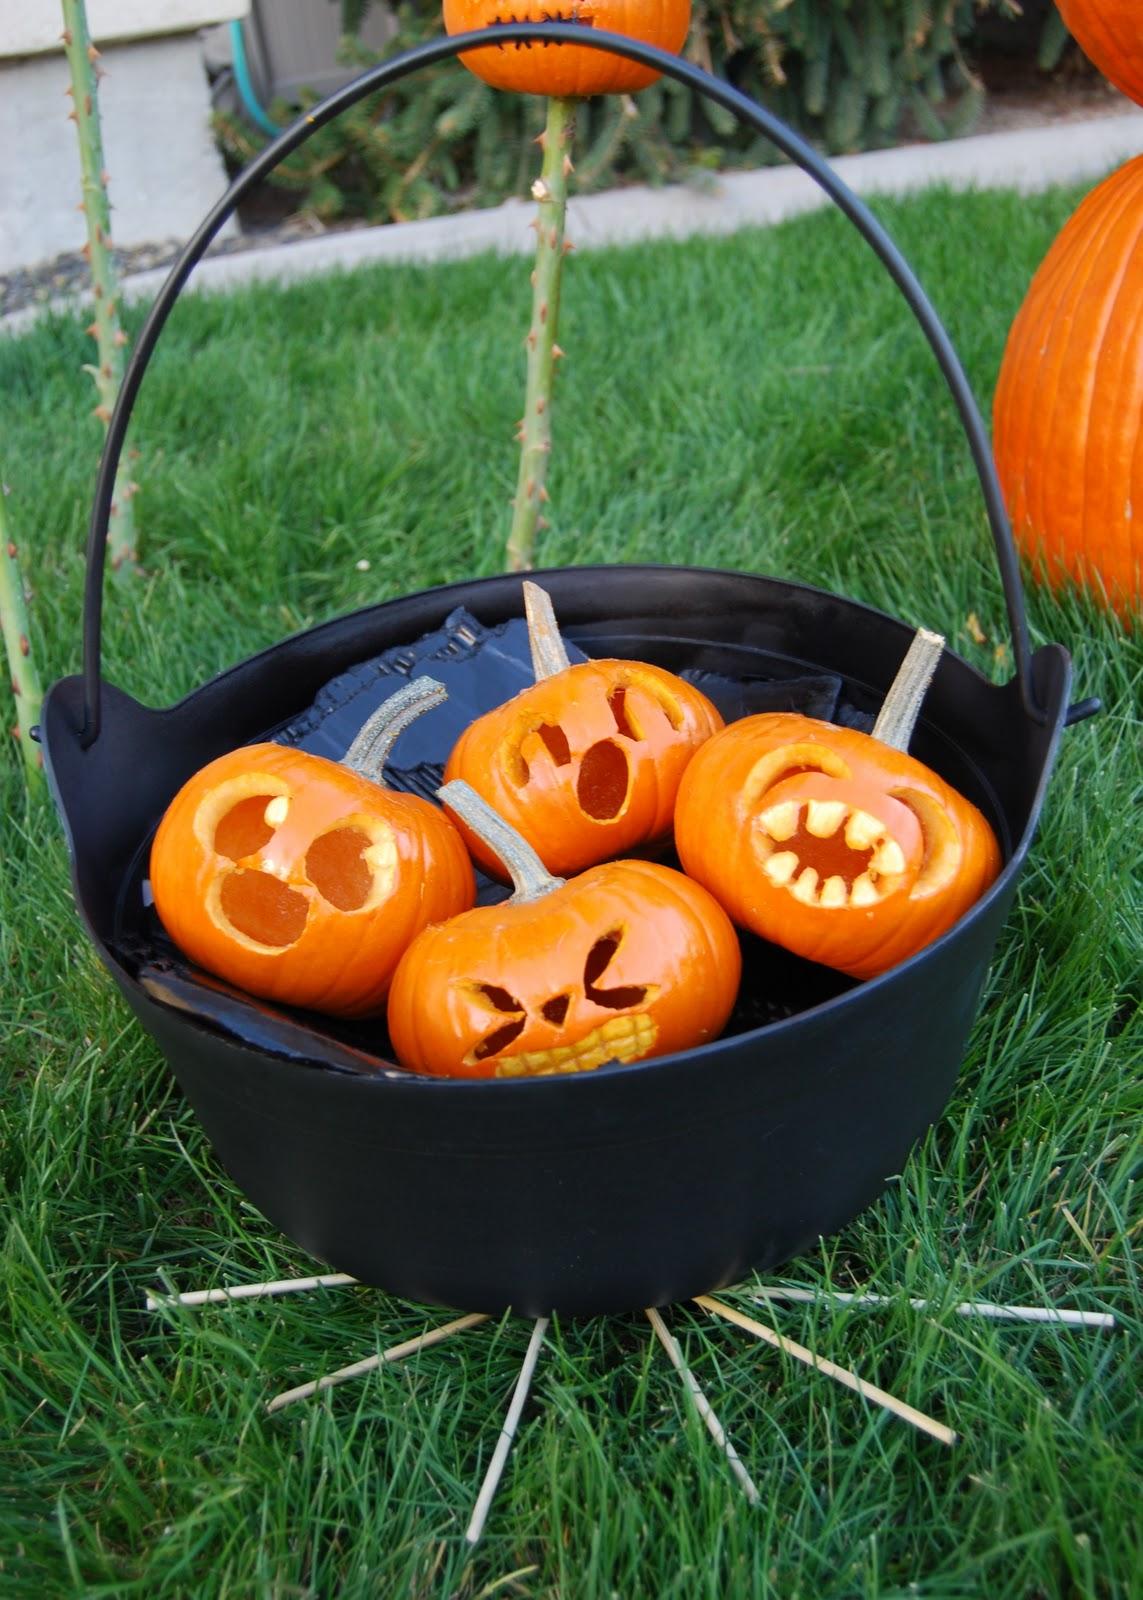 erratic project junkie spooky sunday pumpkin massacre